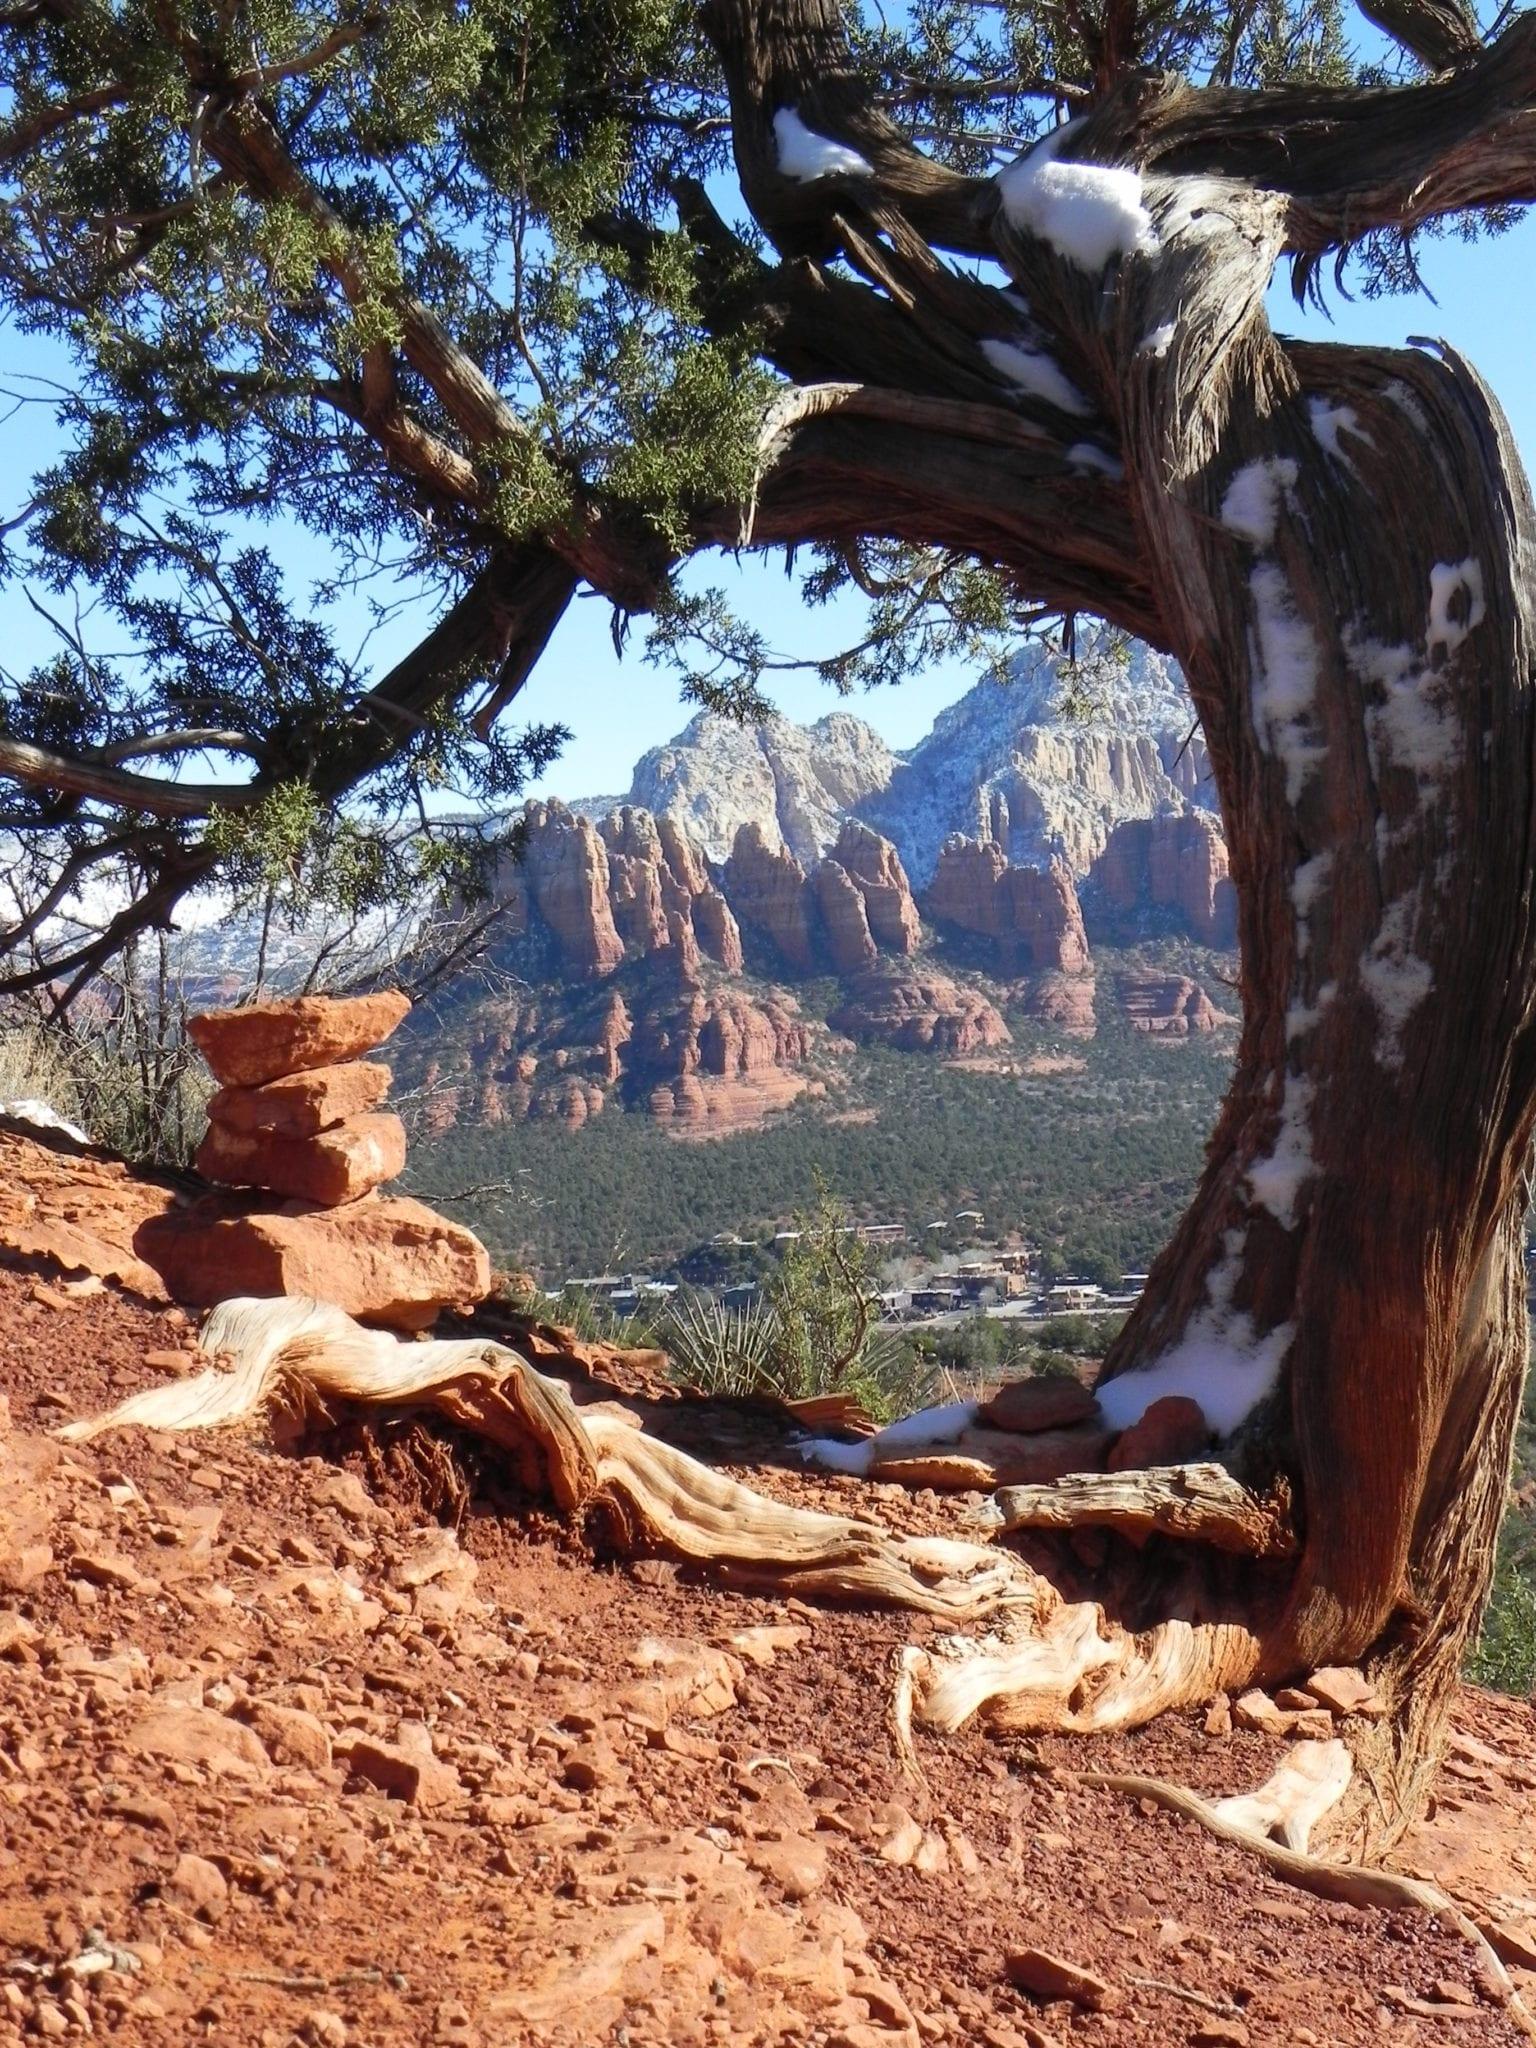 Sedona Vortex Twisted Trees at Airport Mesa Vortex